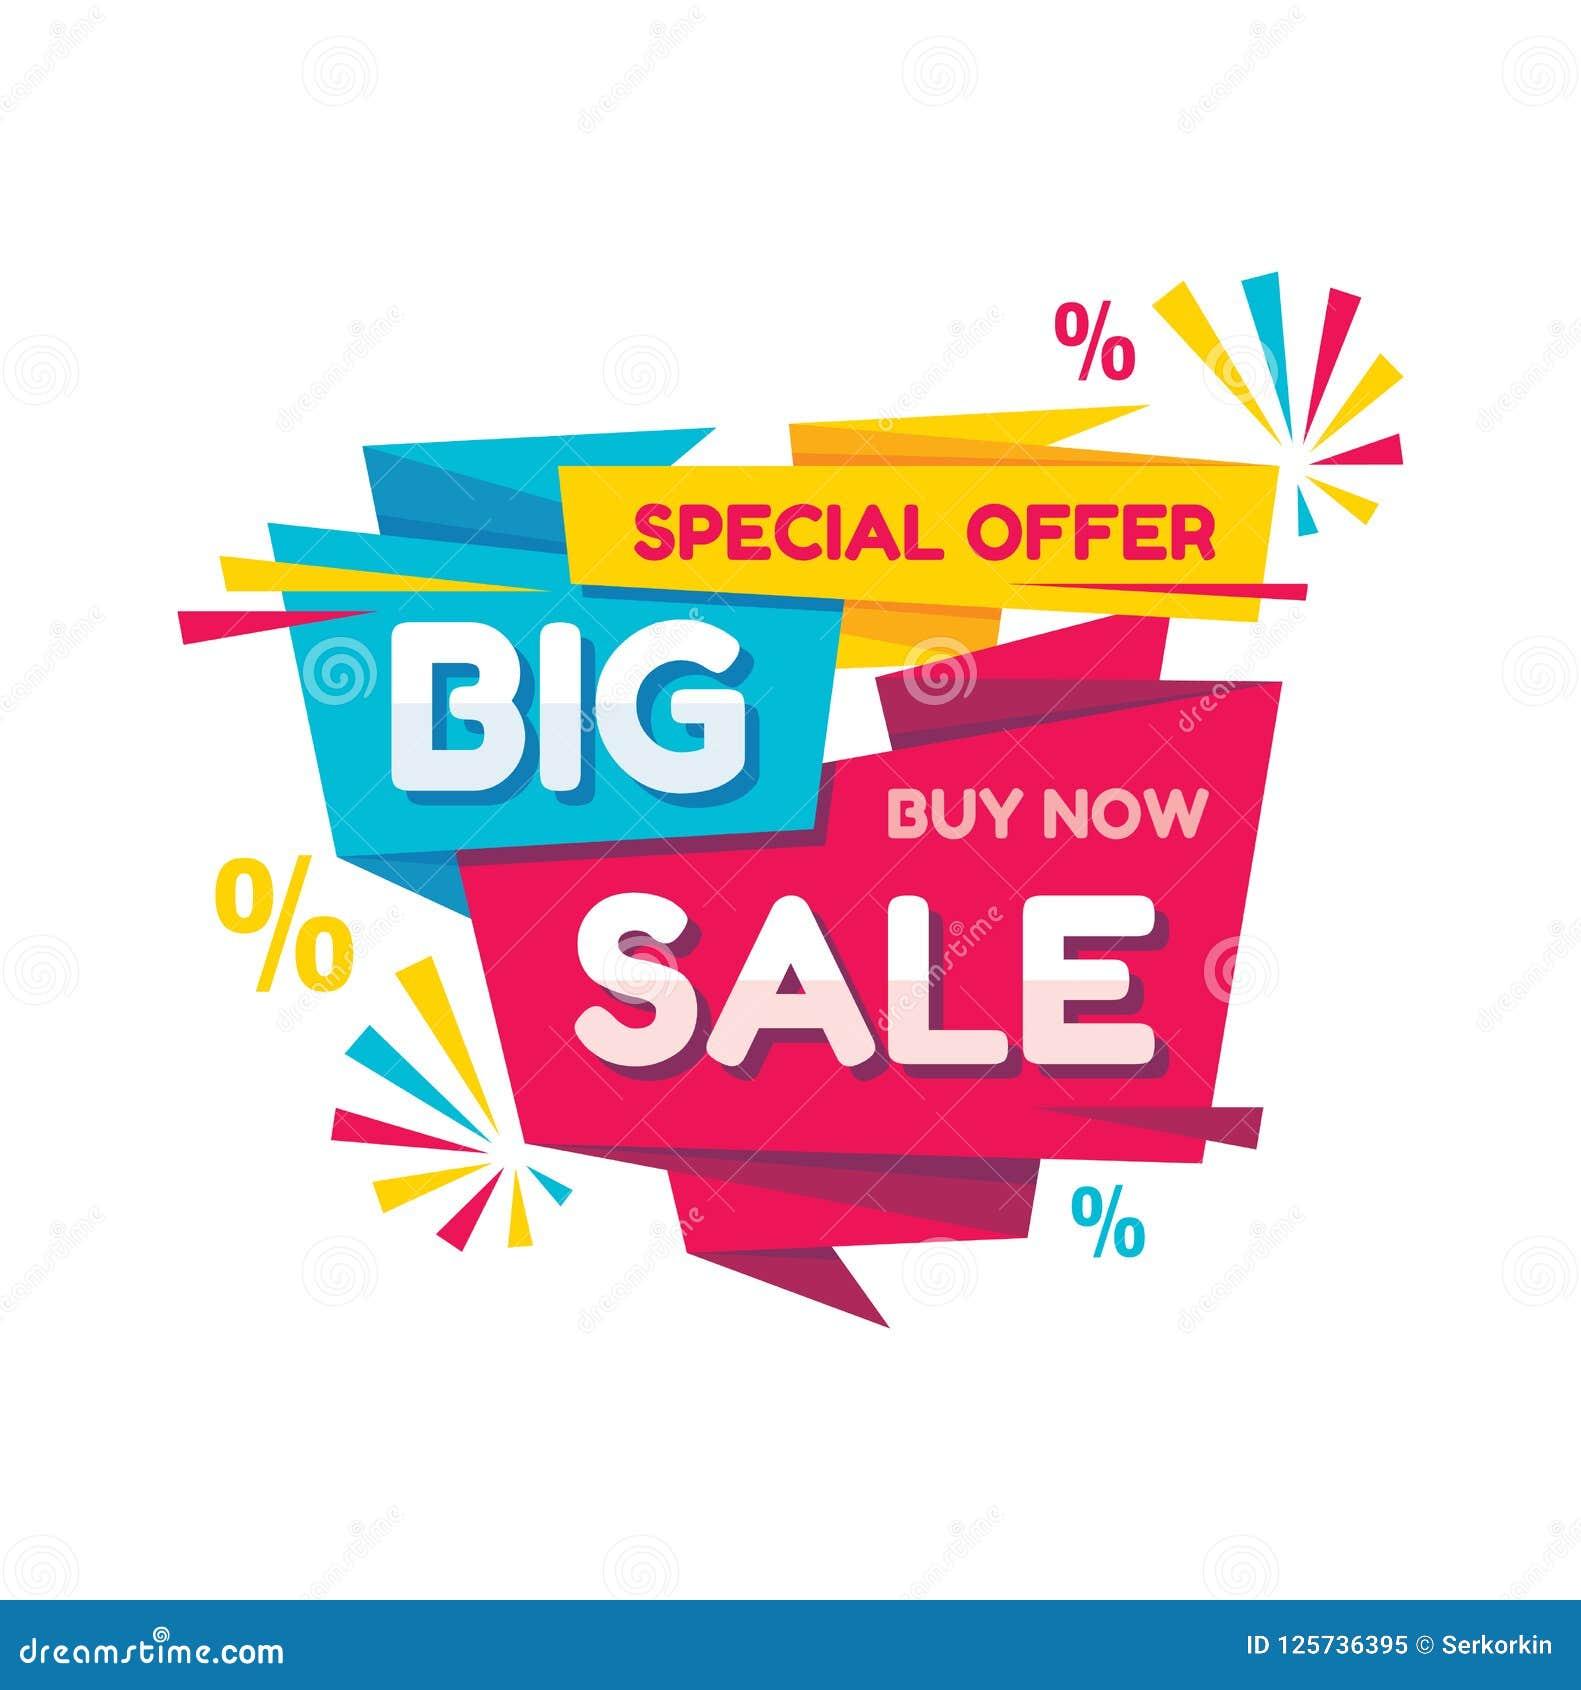 Big Sale Vector Creative Banner Illustration Abstract